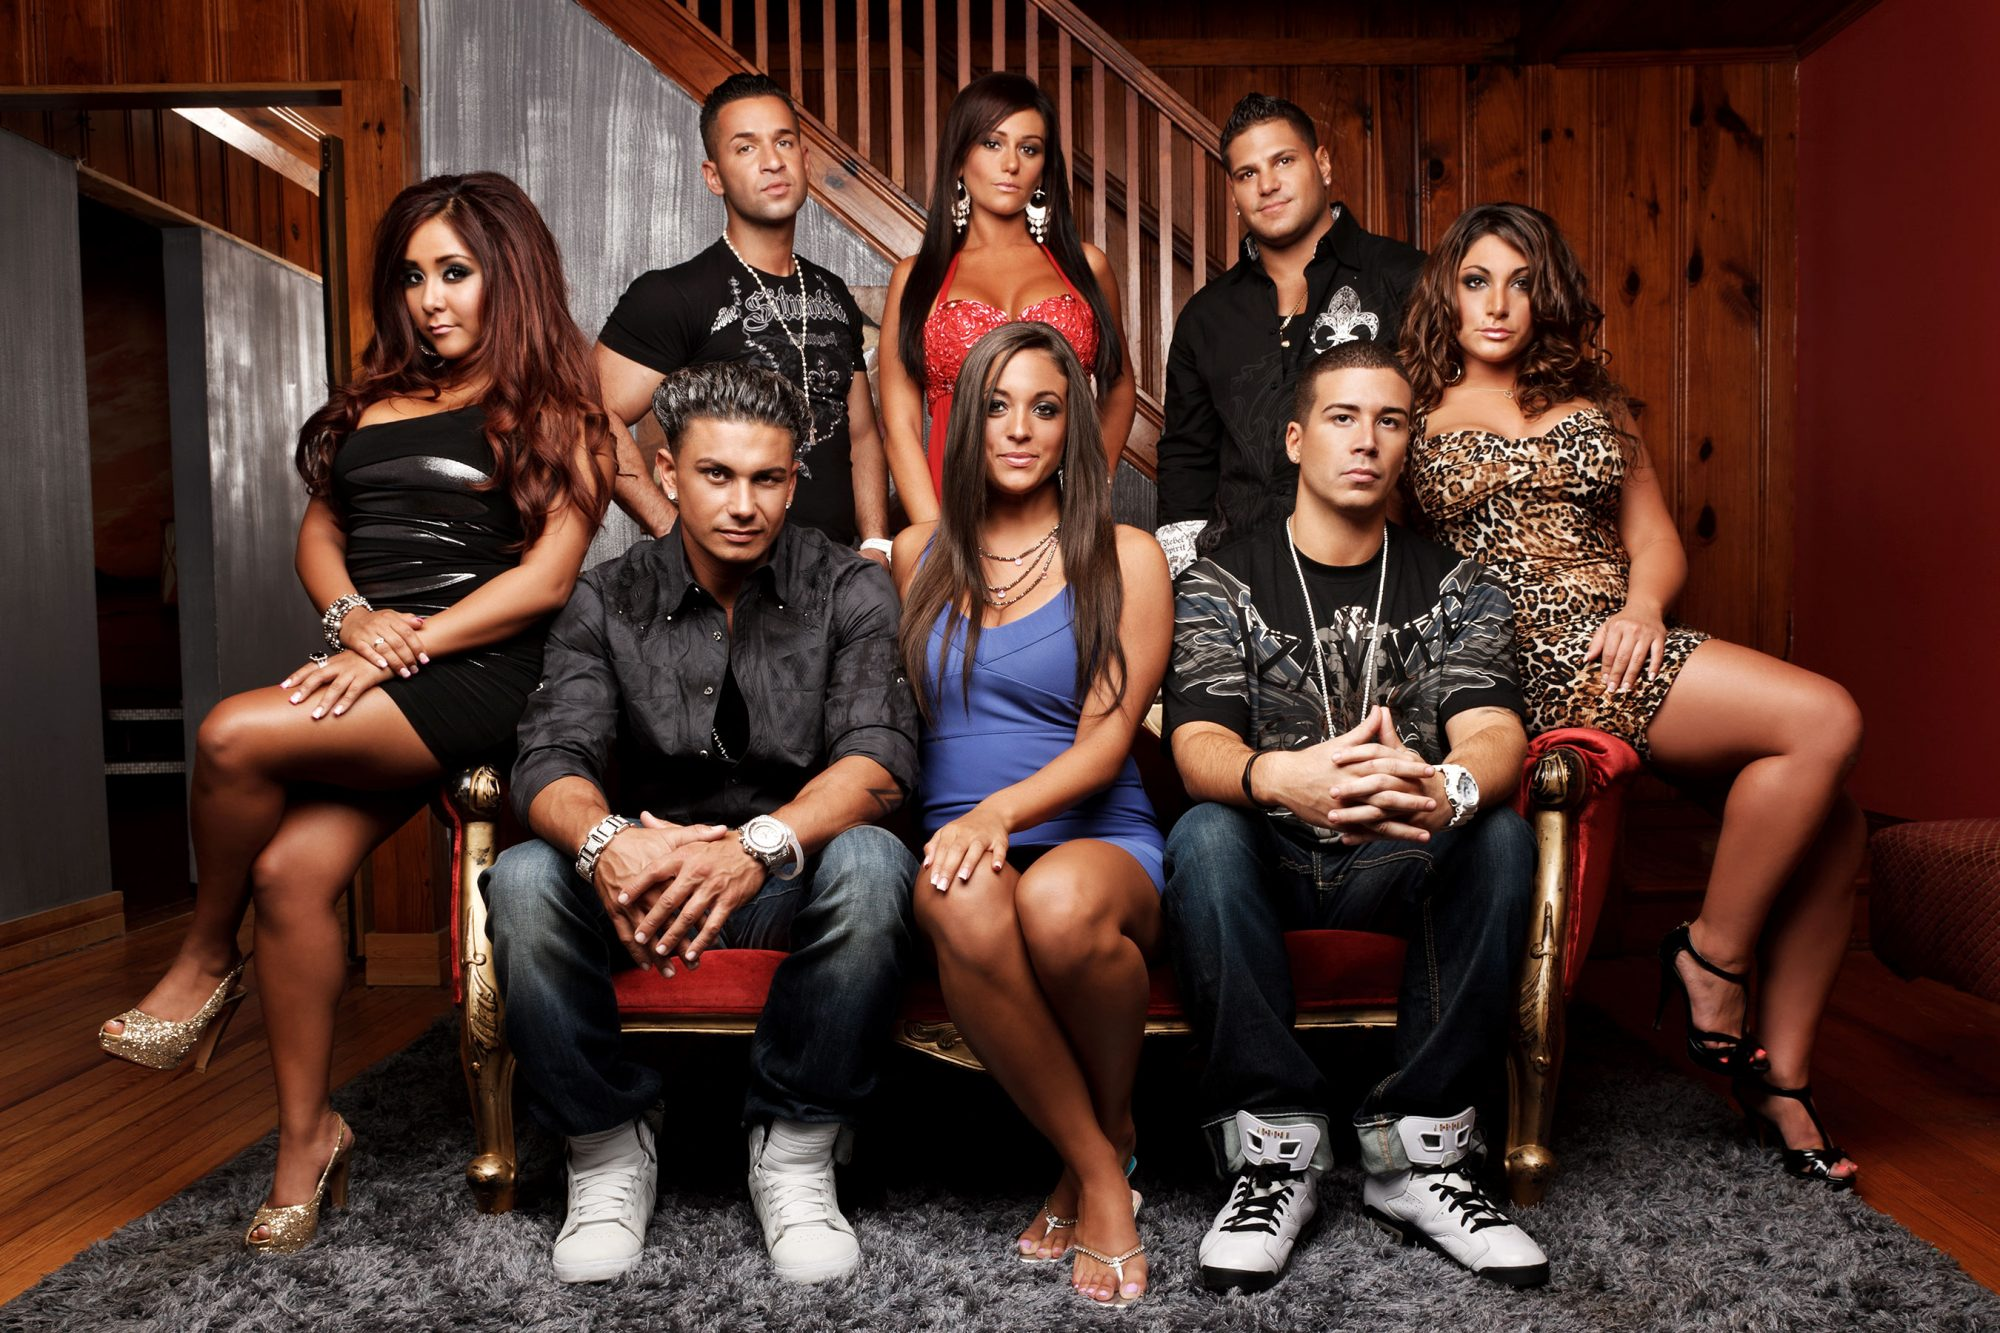 Jersey Shore, season 3. 2011.